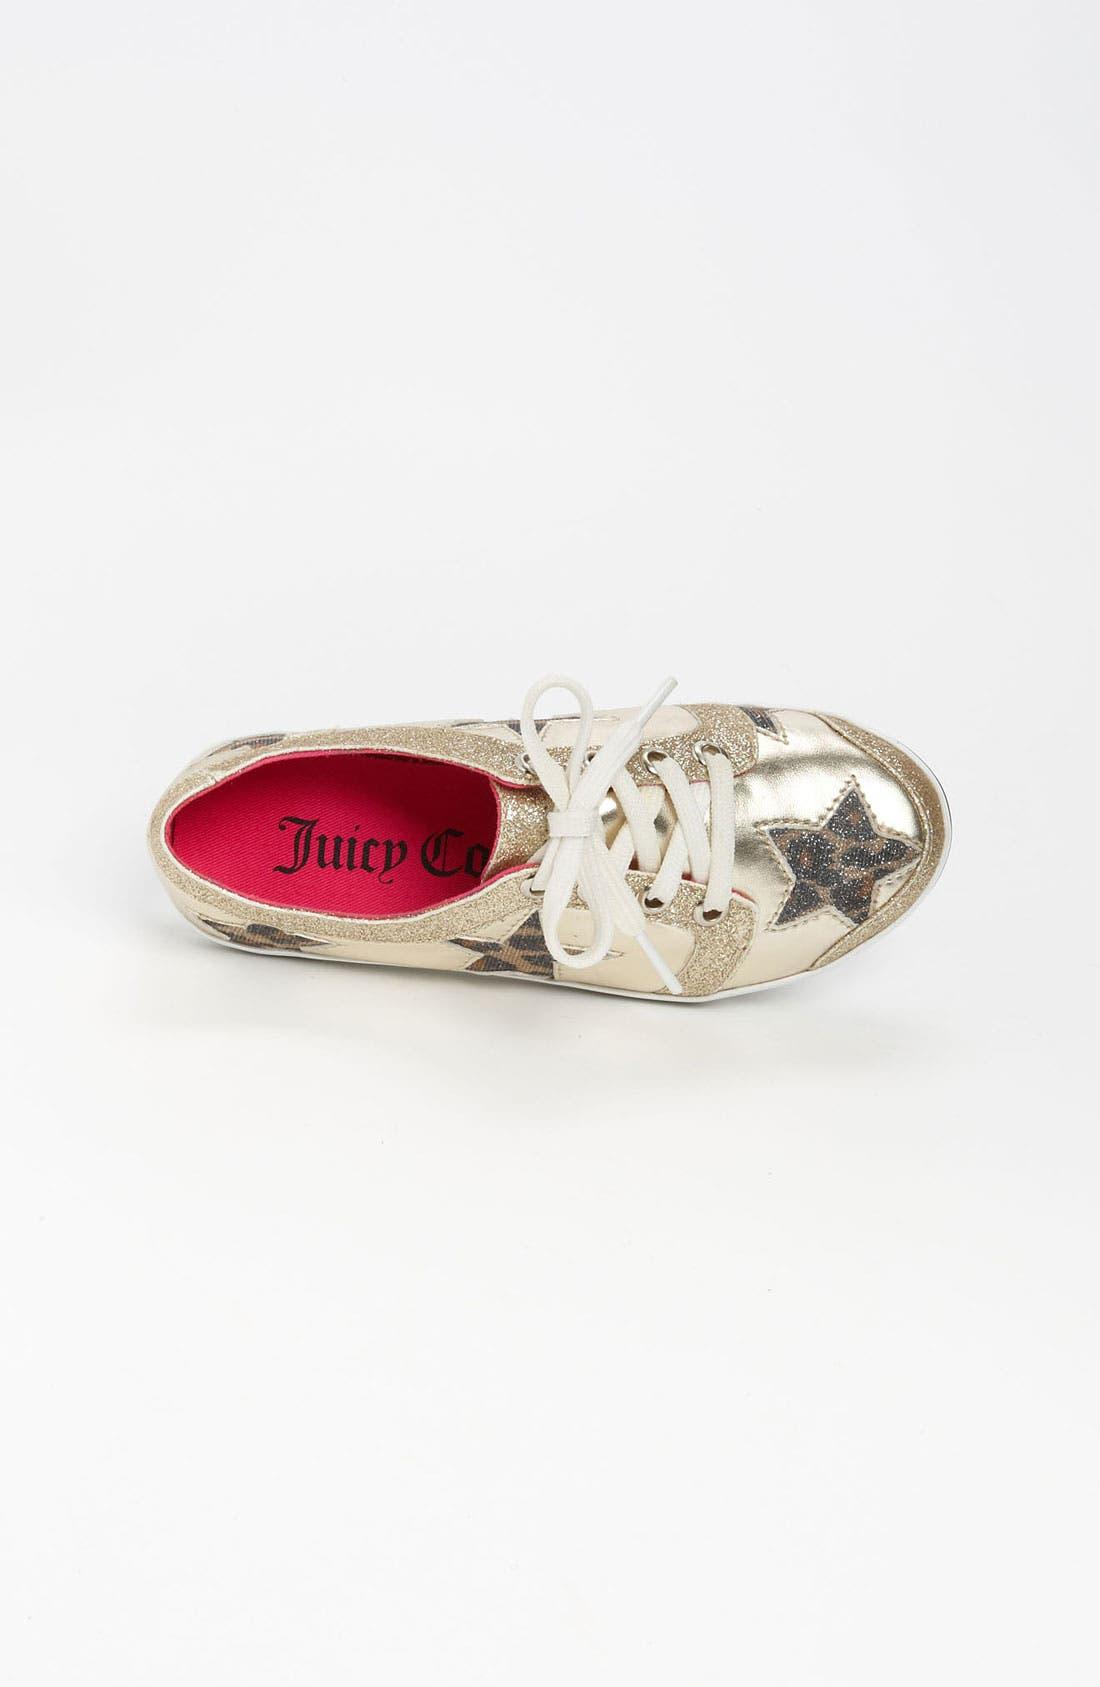 Alternate Image 3  - Juicy Couture 'Star' Sneaker (Toddler, Little Kid & Big Kid)